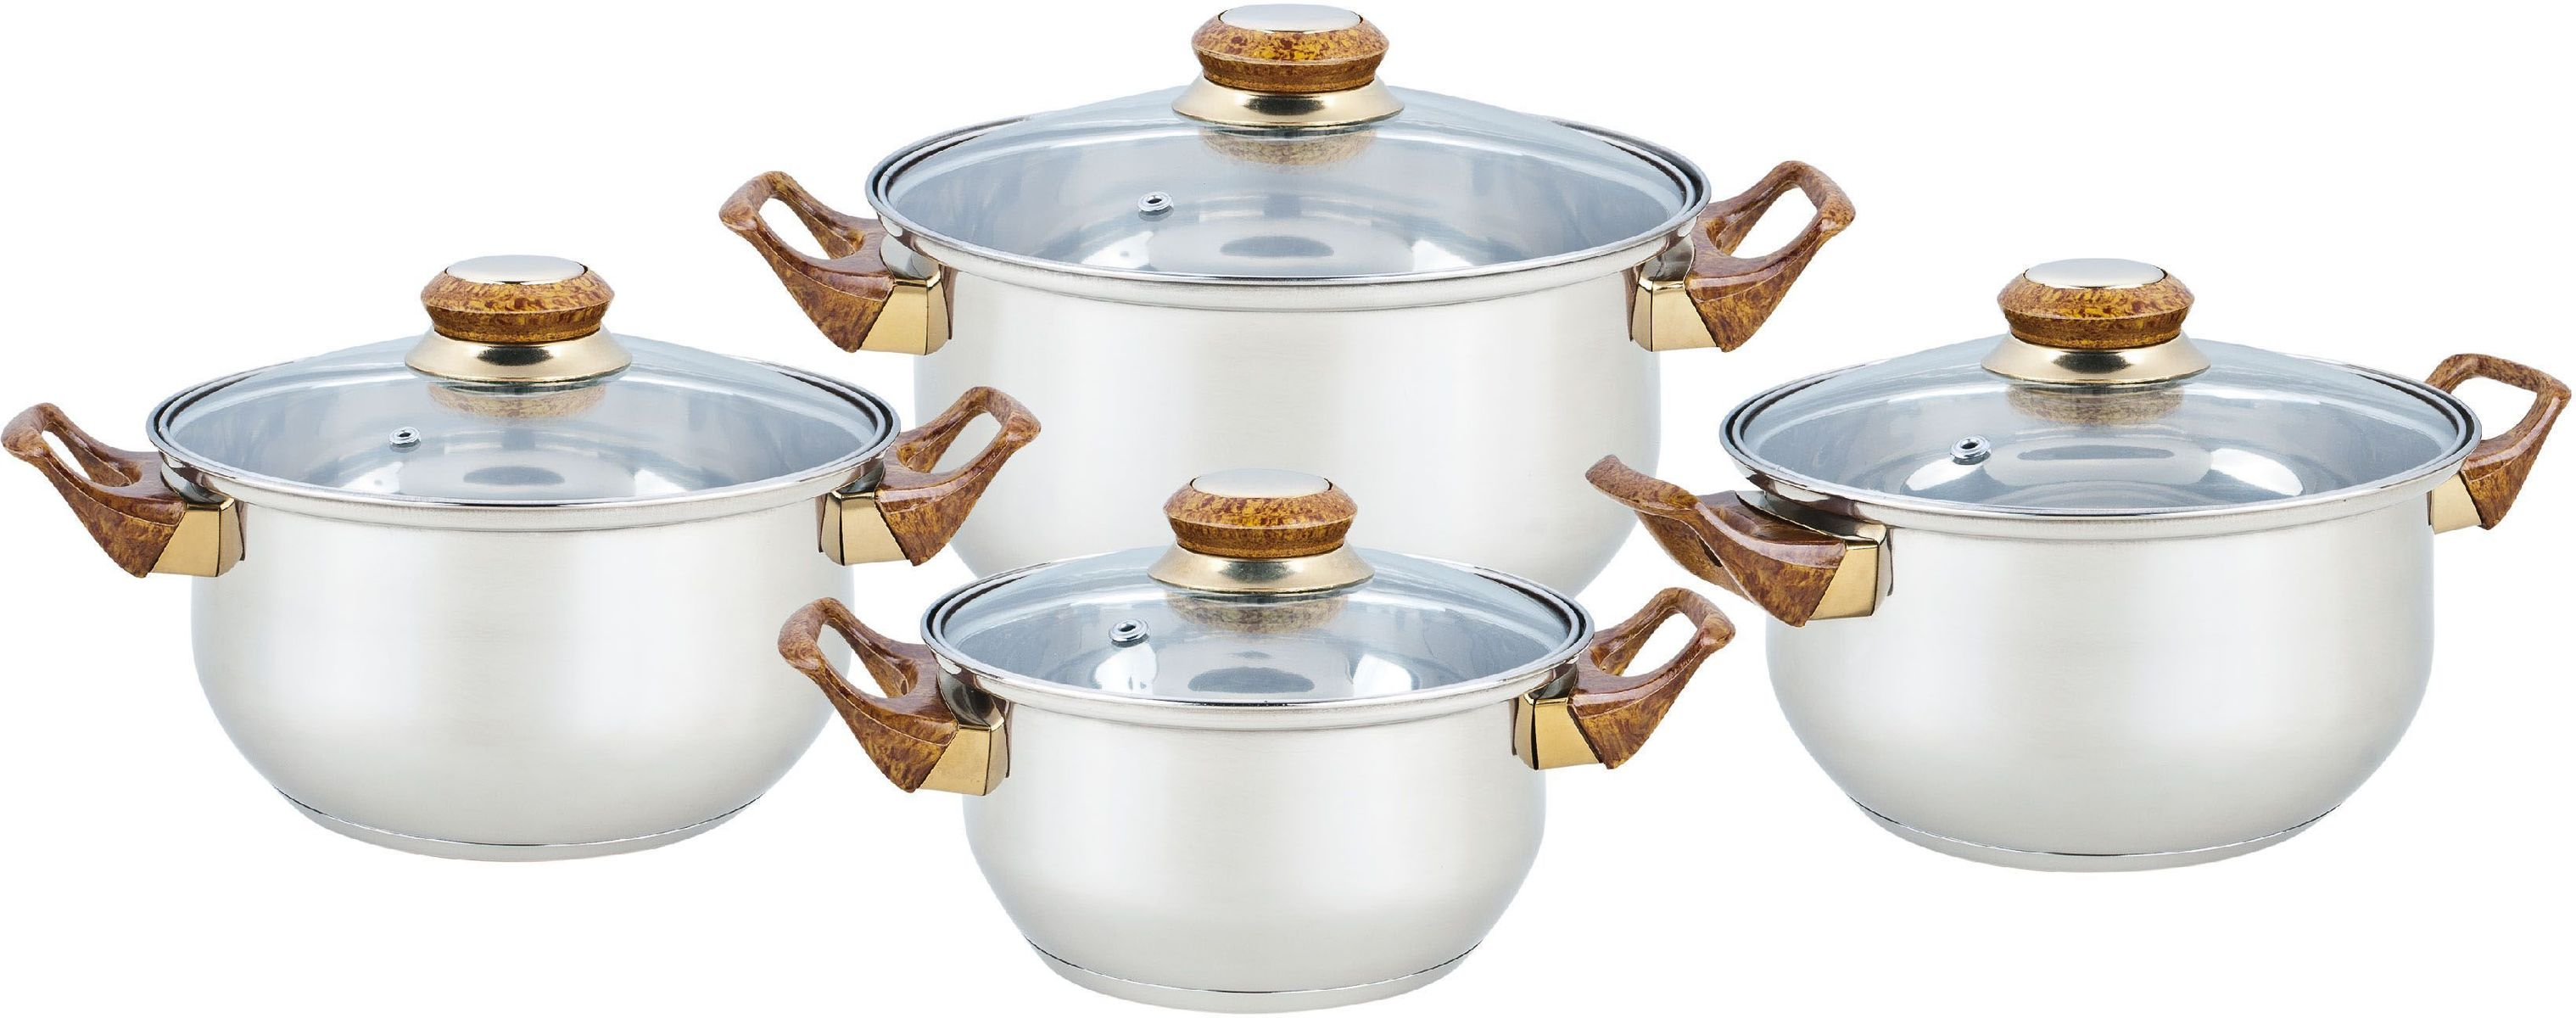 Набор посуды Bekker Classic, 8 предметов. BK-4604 набор посуды bekker classic 9 предметов bk 4605